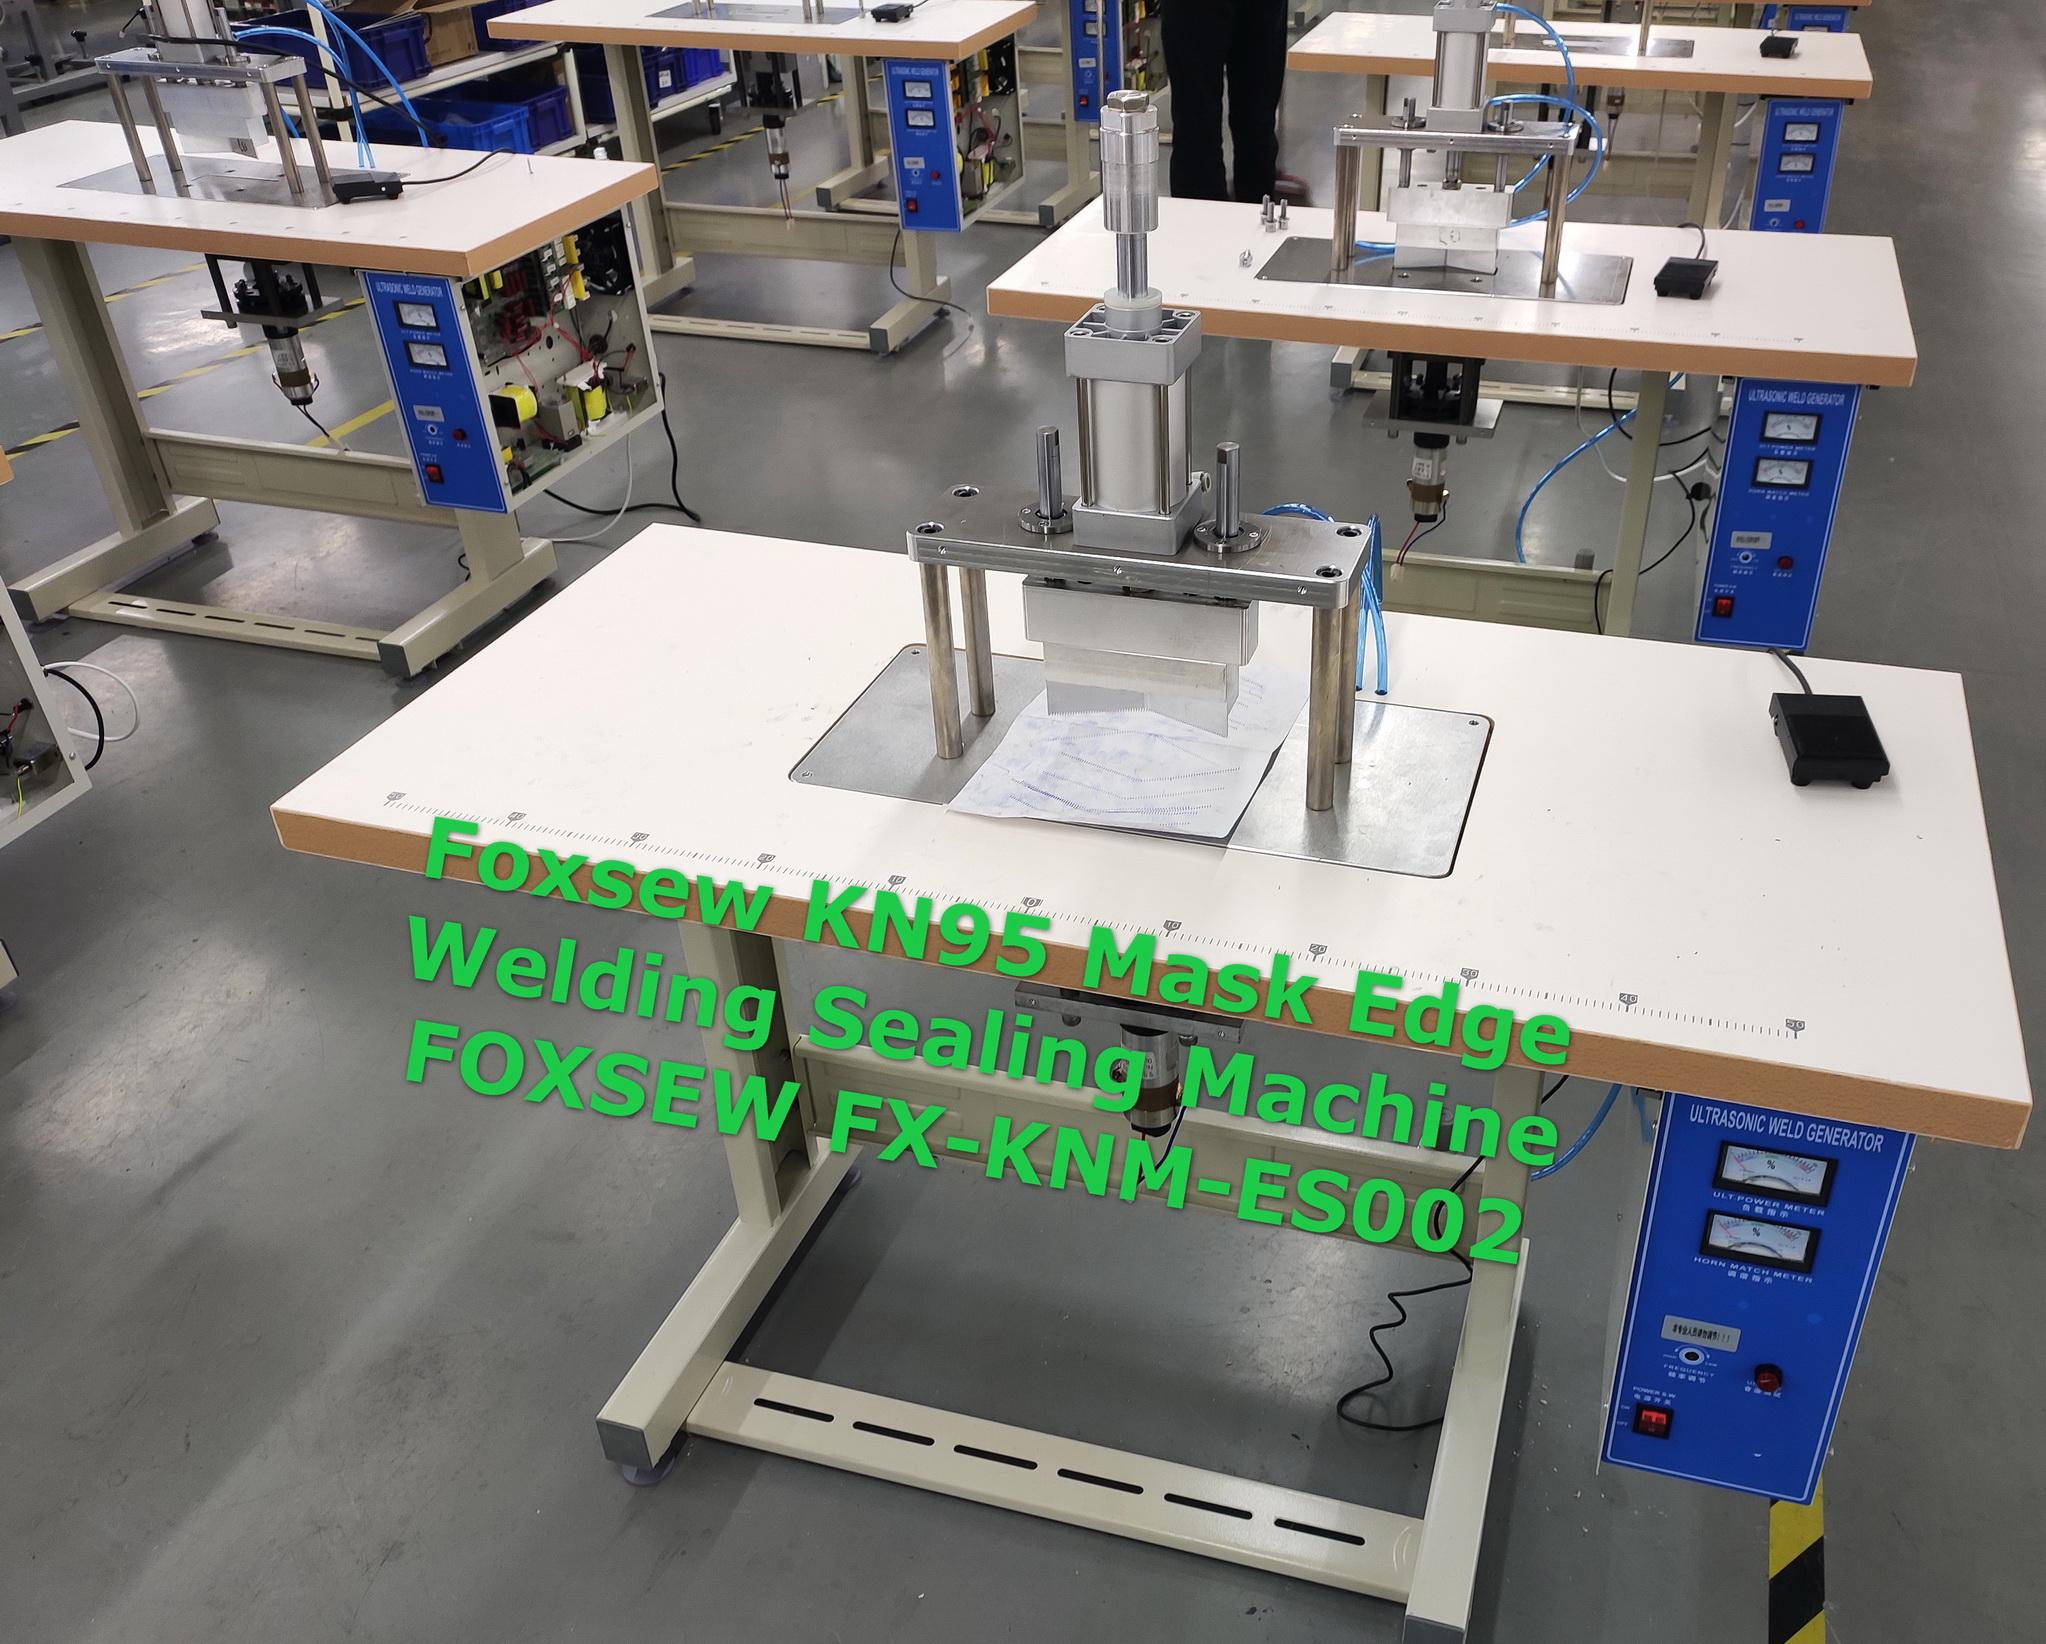 Ultrasonic KN95 Mask Edge Welding Sealing Machine FOXSEW FX-KNM-ES002 -3